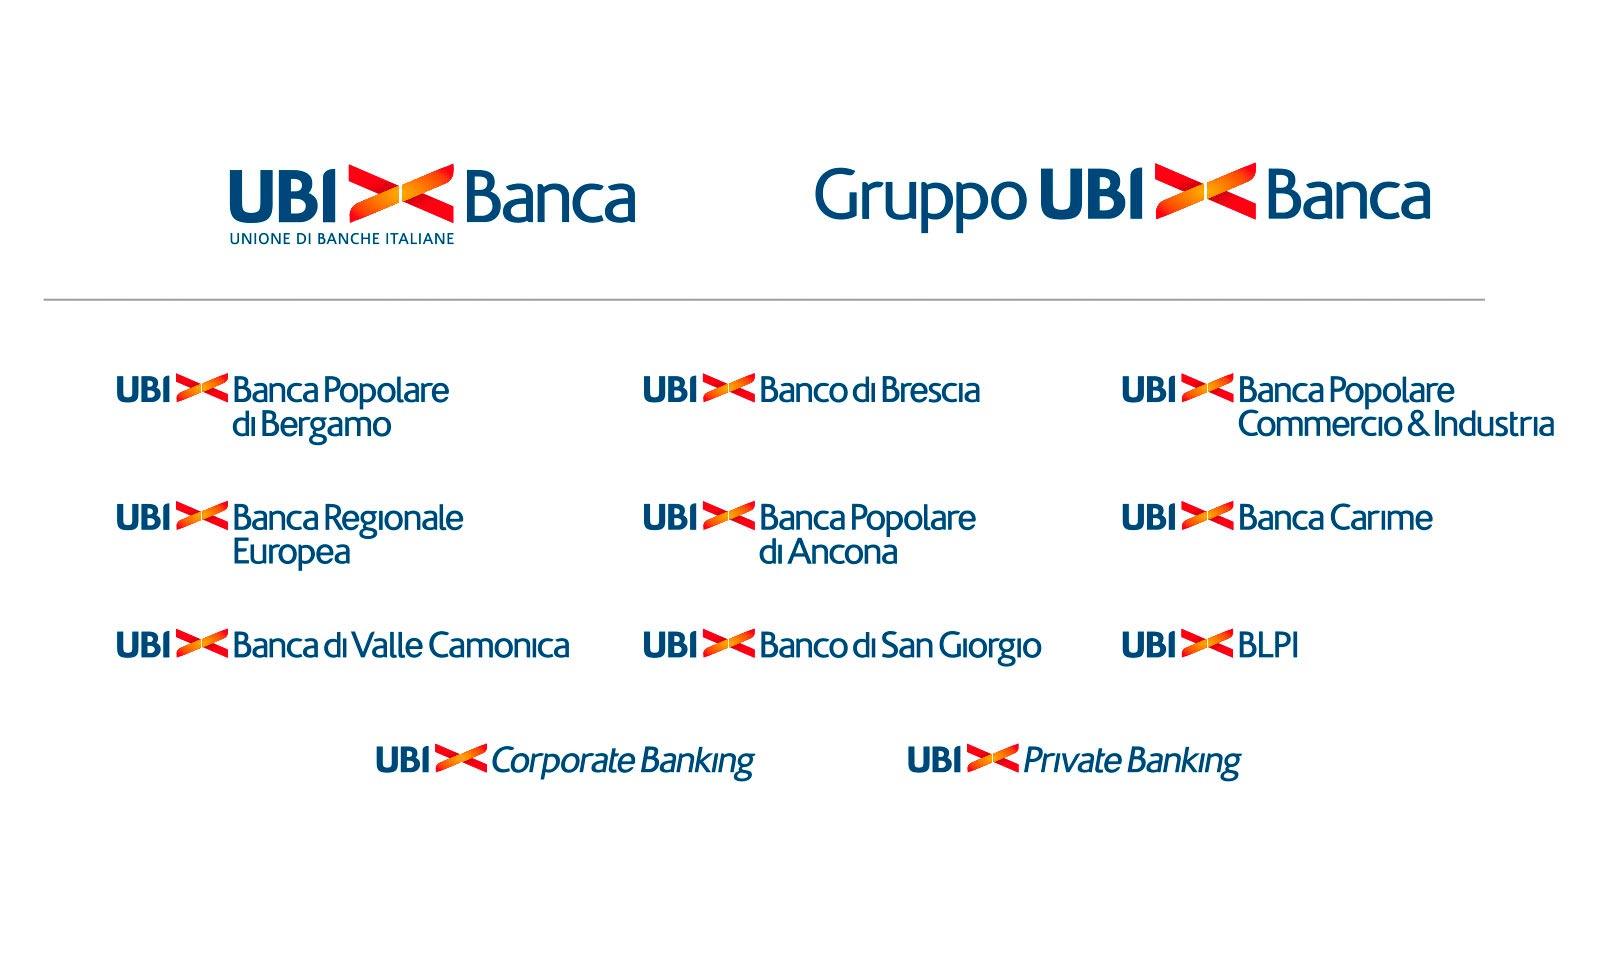 ubi banca rebranding brand architecture